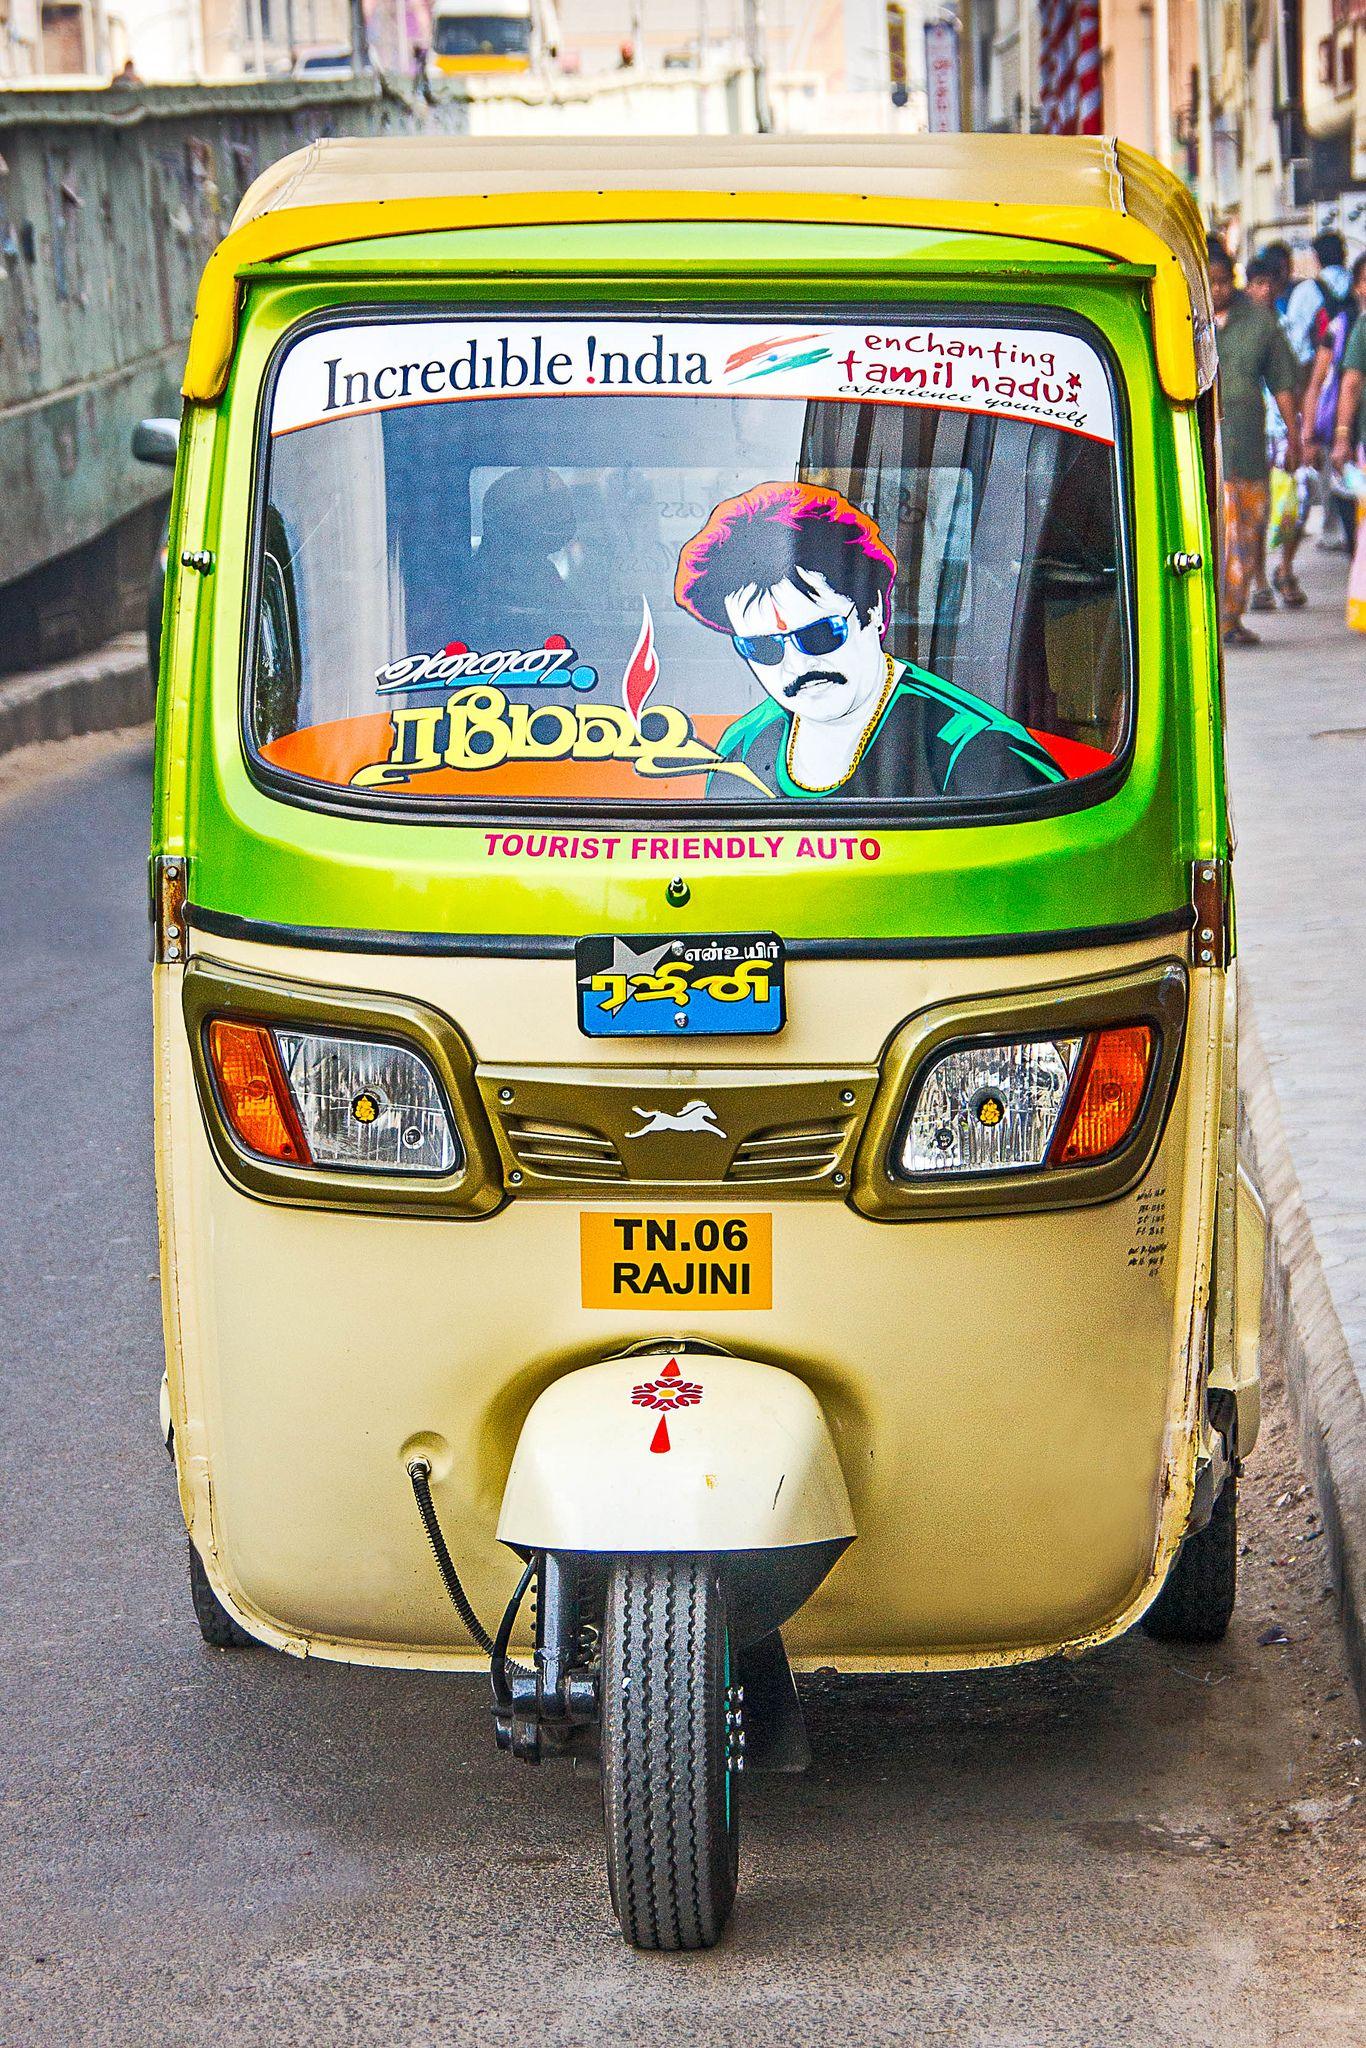 The Rajinikanth Auto Rickshaw The incredibles, Amazing